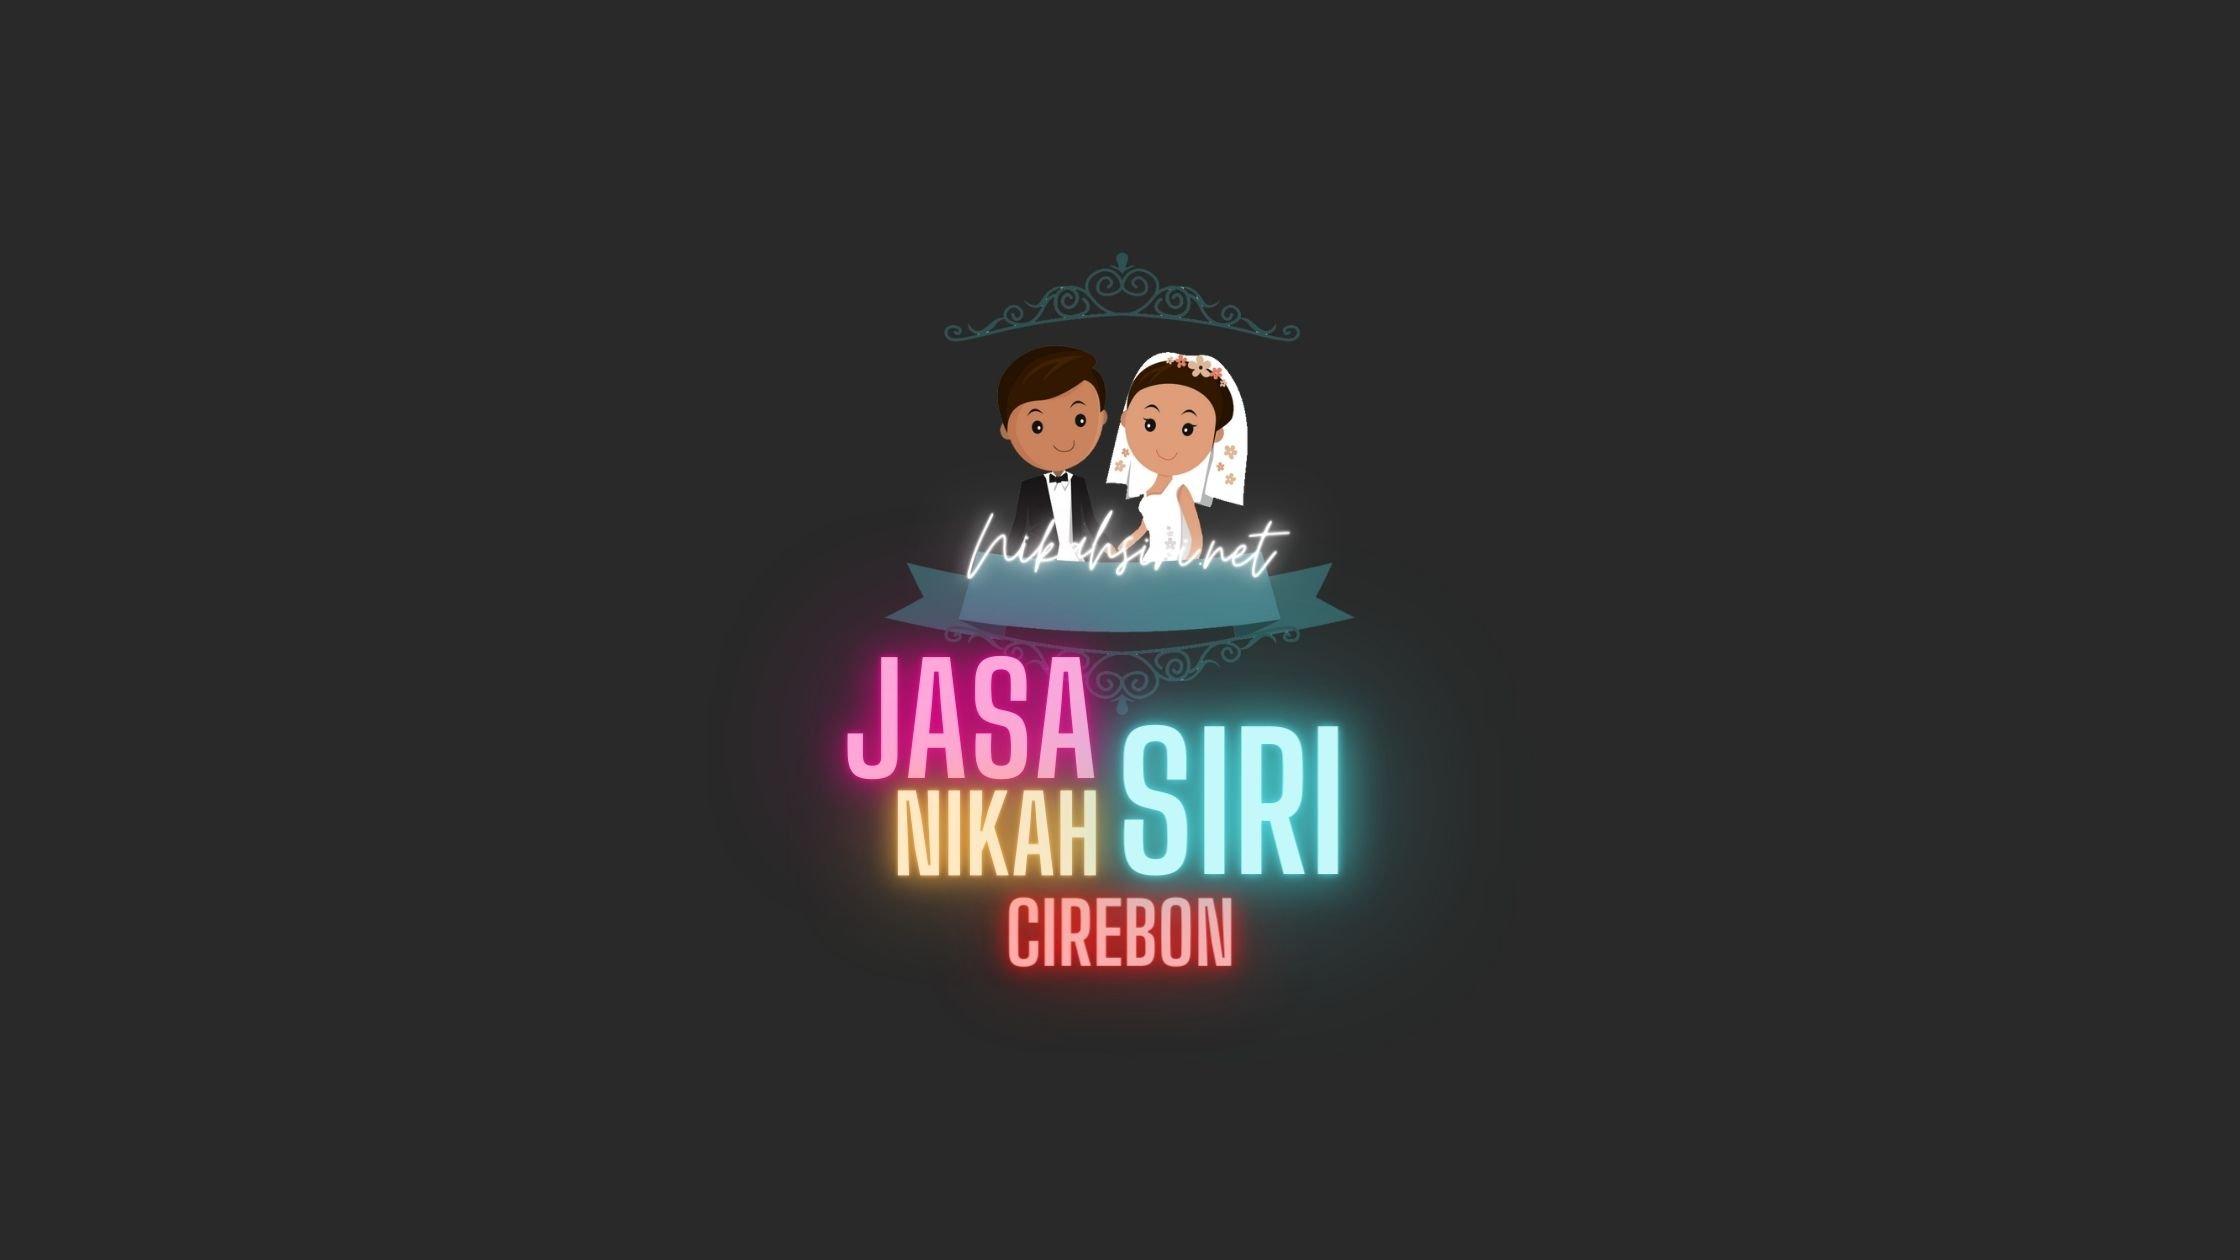 Jasa Nikah Siri Cirebon